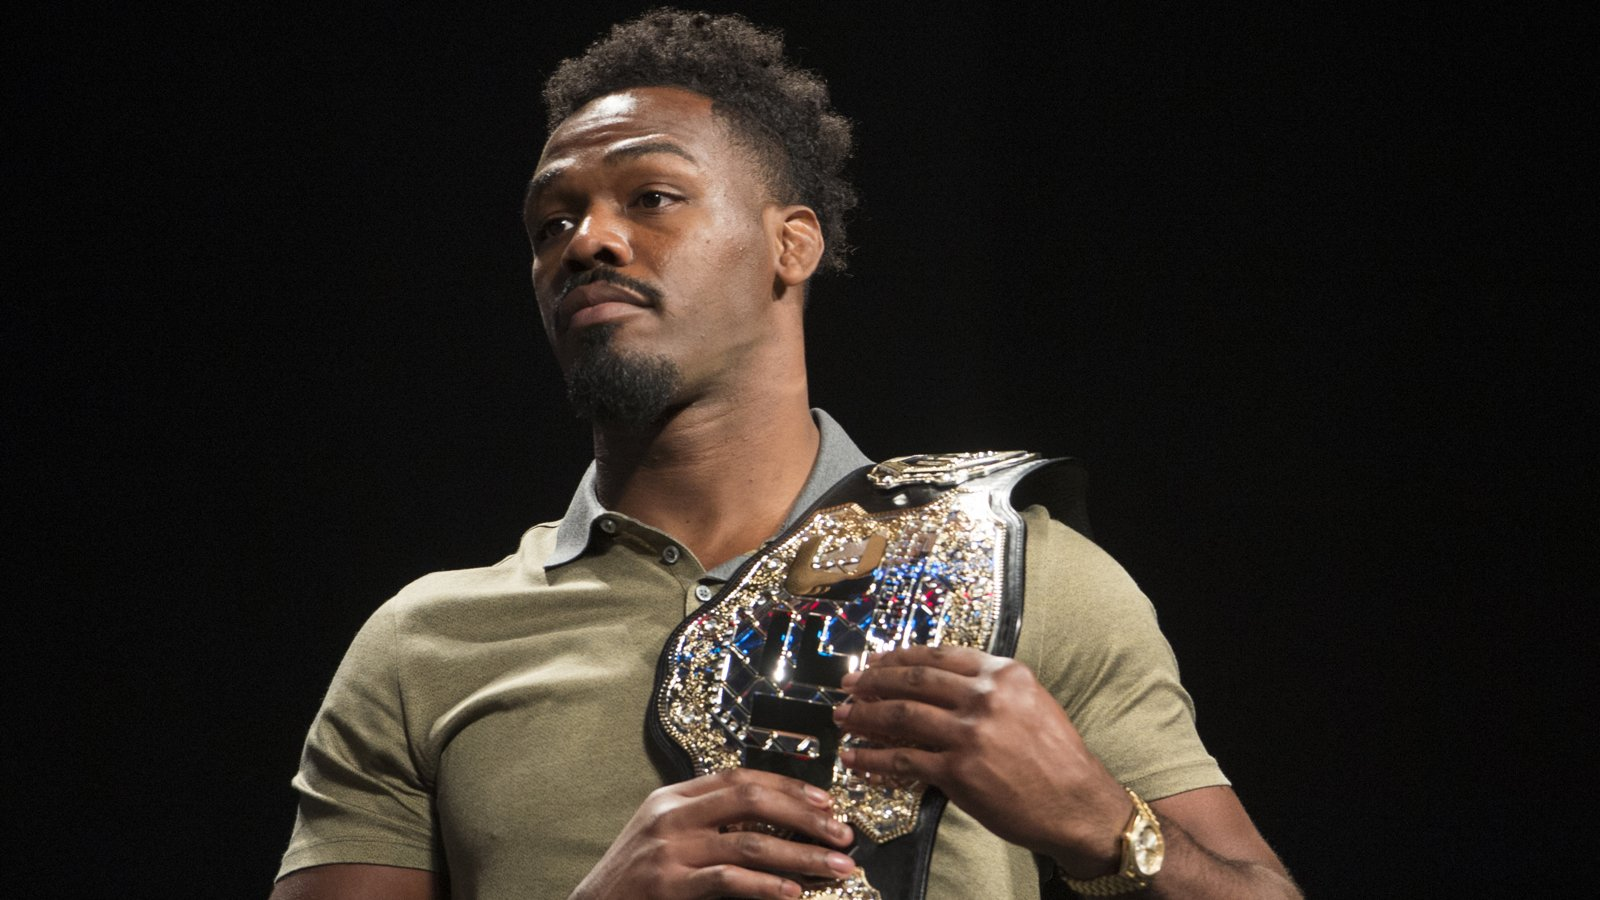 Jon Jones slams Daniel Cormier: 'You're not a champion'  https://t.co/9U1lbcht9Z #UFC #UFC214 https://t.co/loC4EzPvjp